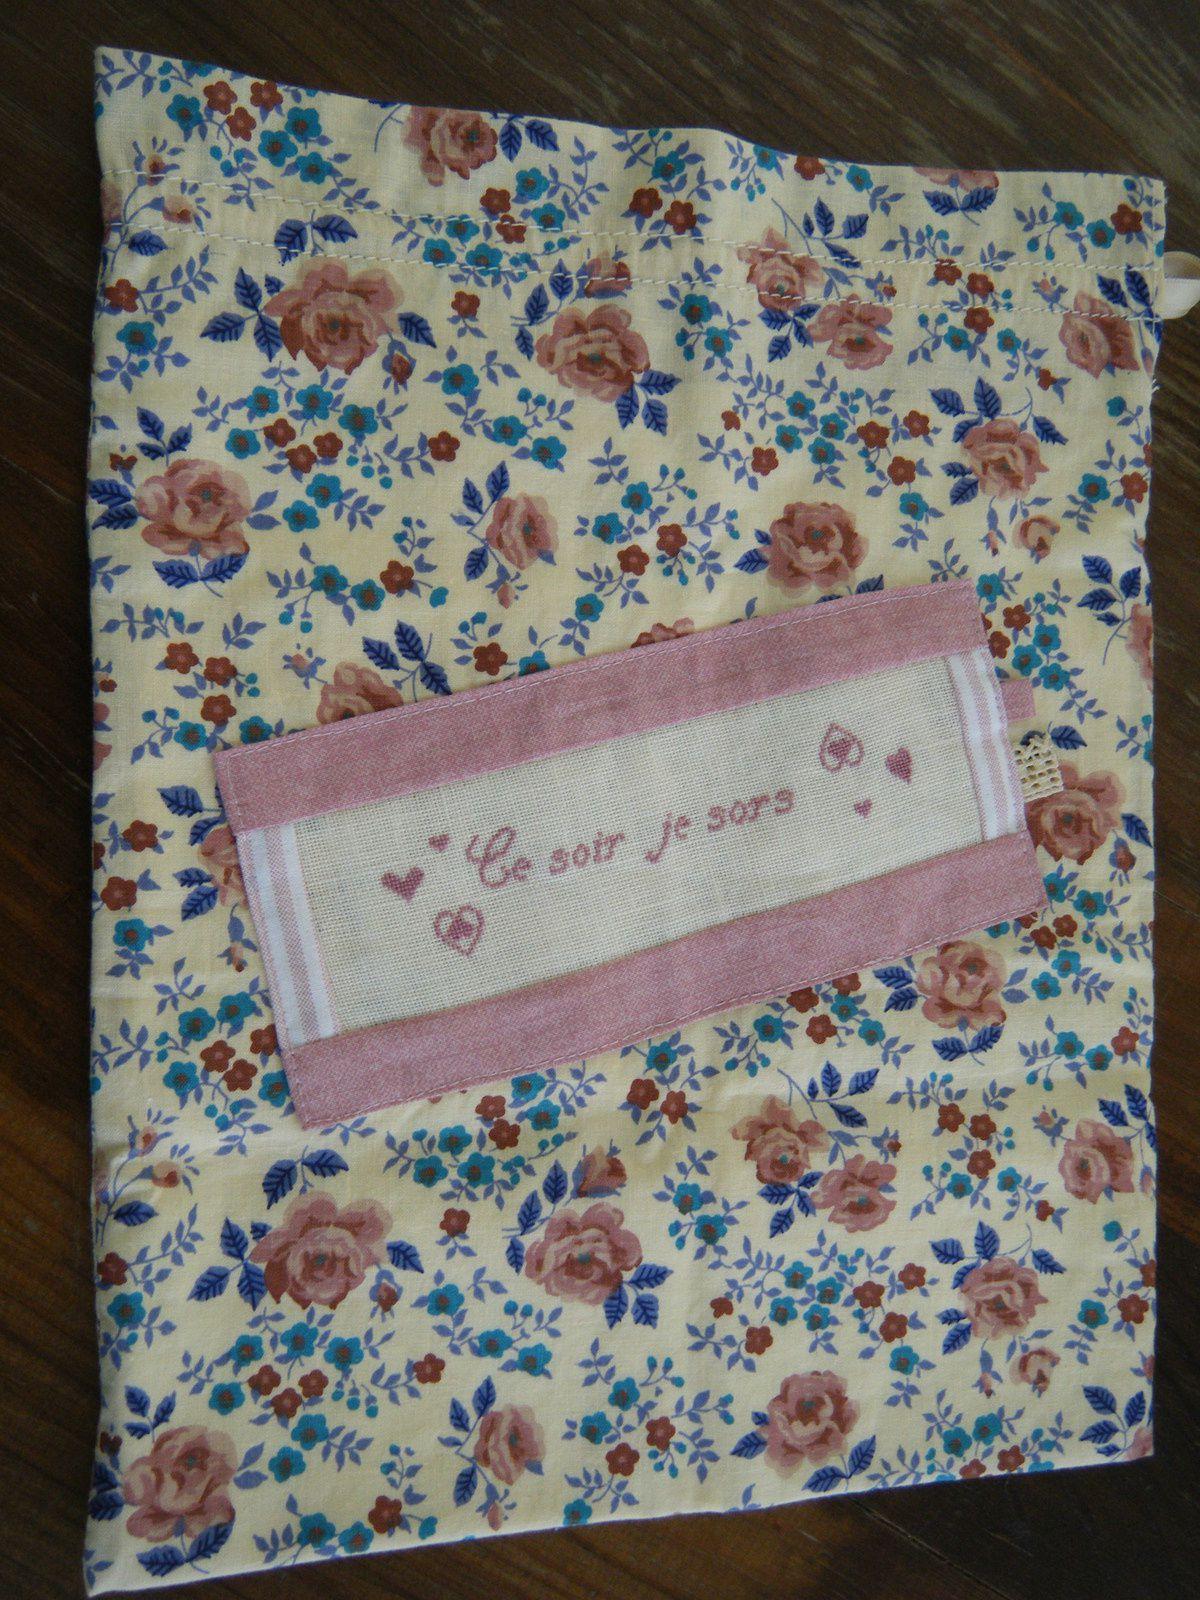 J'ai craqué sur ce joli tissu fleuri, assez vintage...